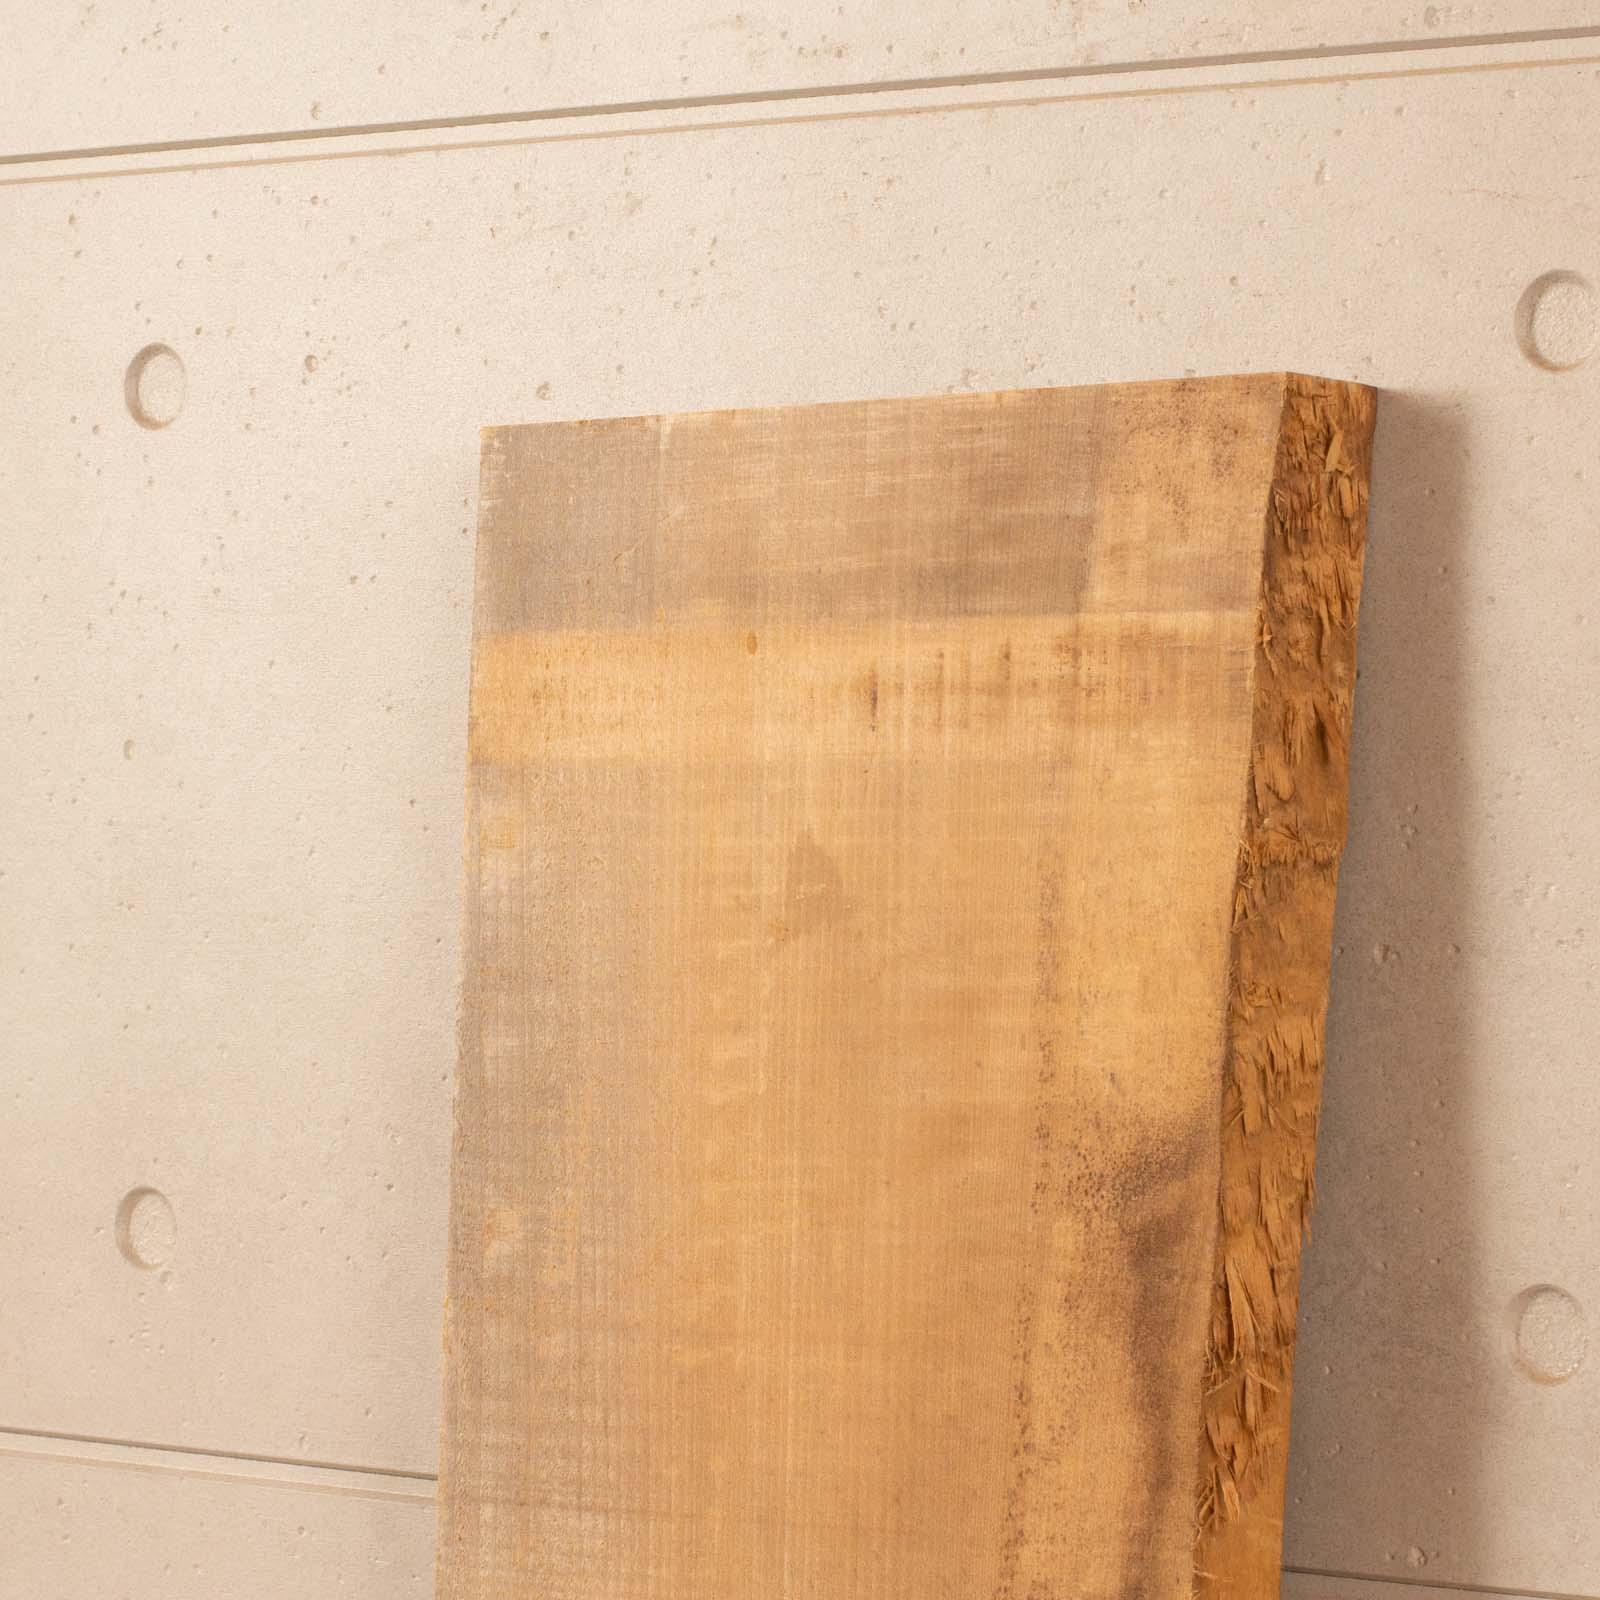 25-014 朴(ホウ) 一枚板 西野製材所 (飛騨市)